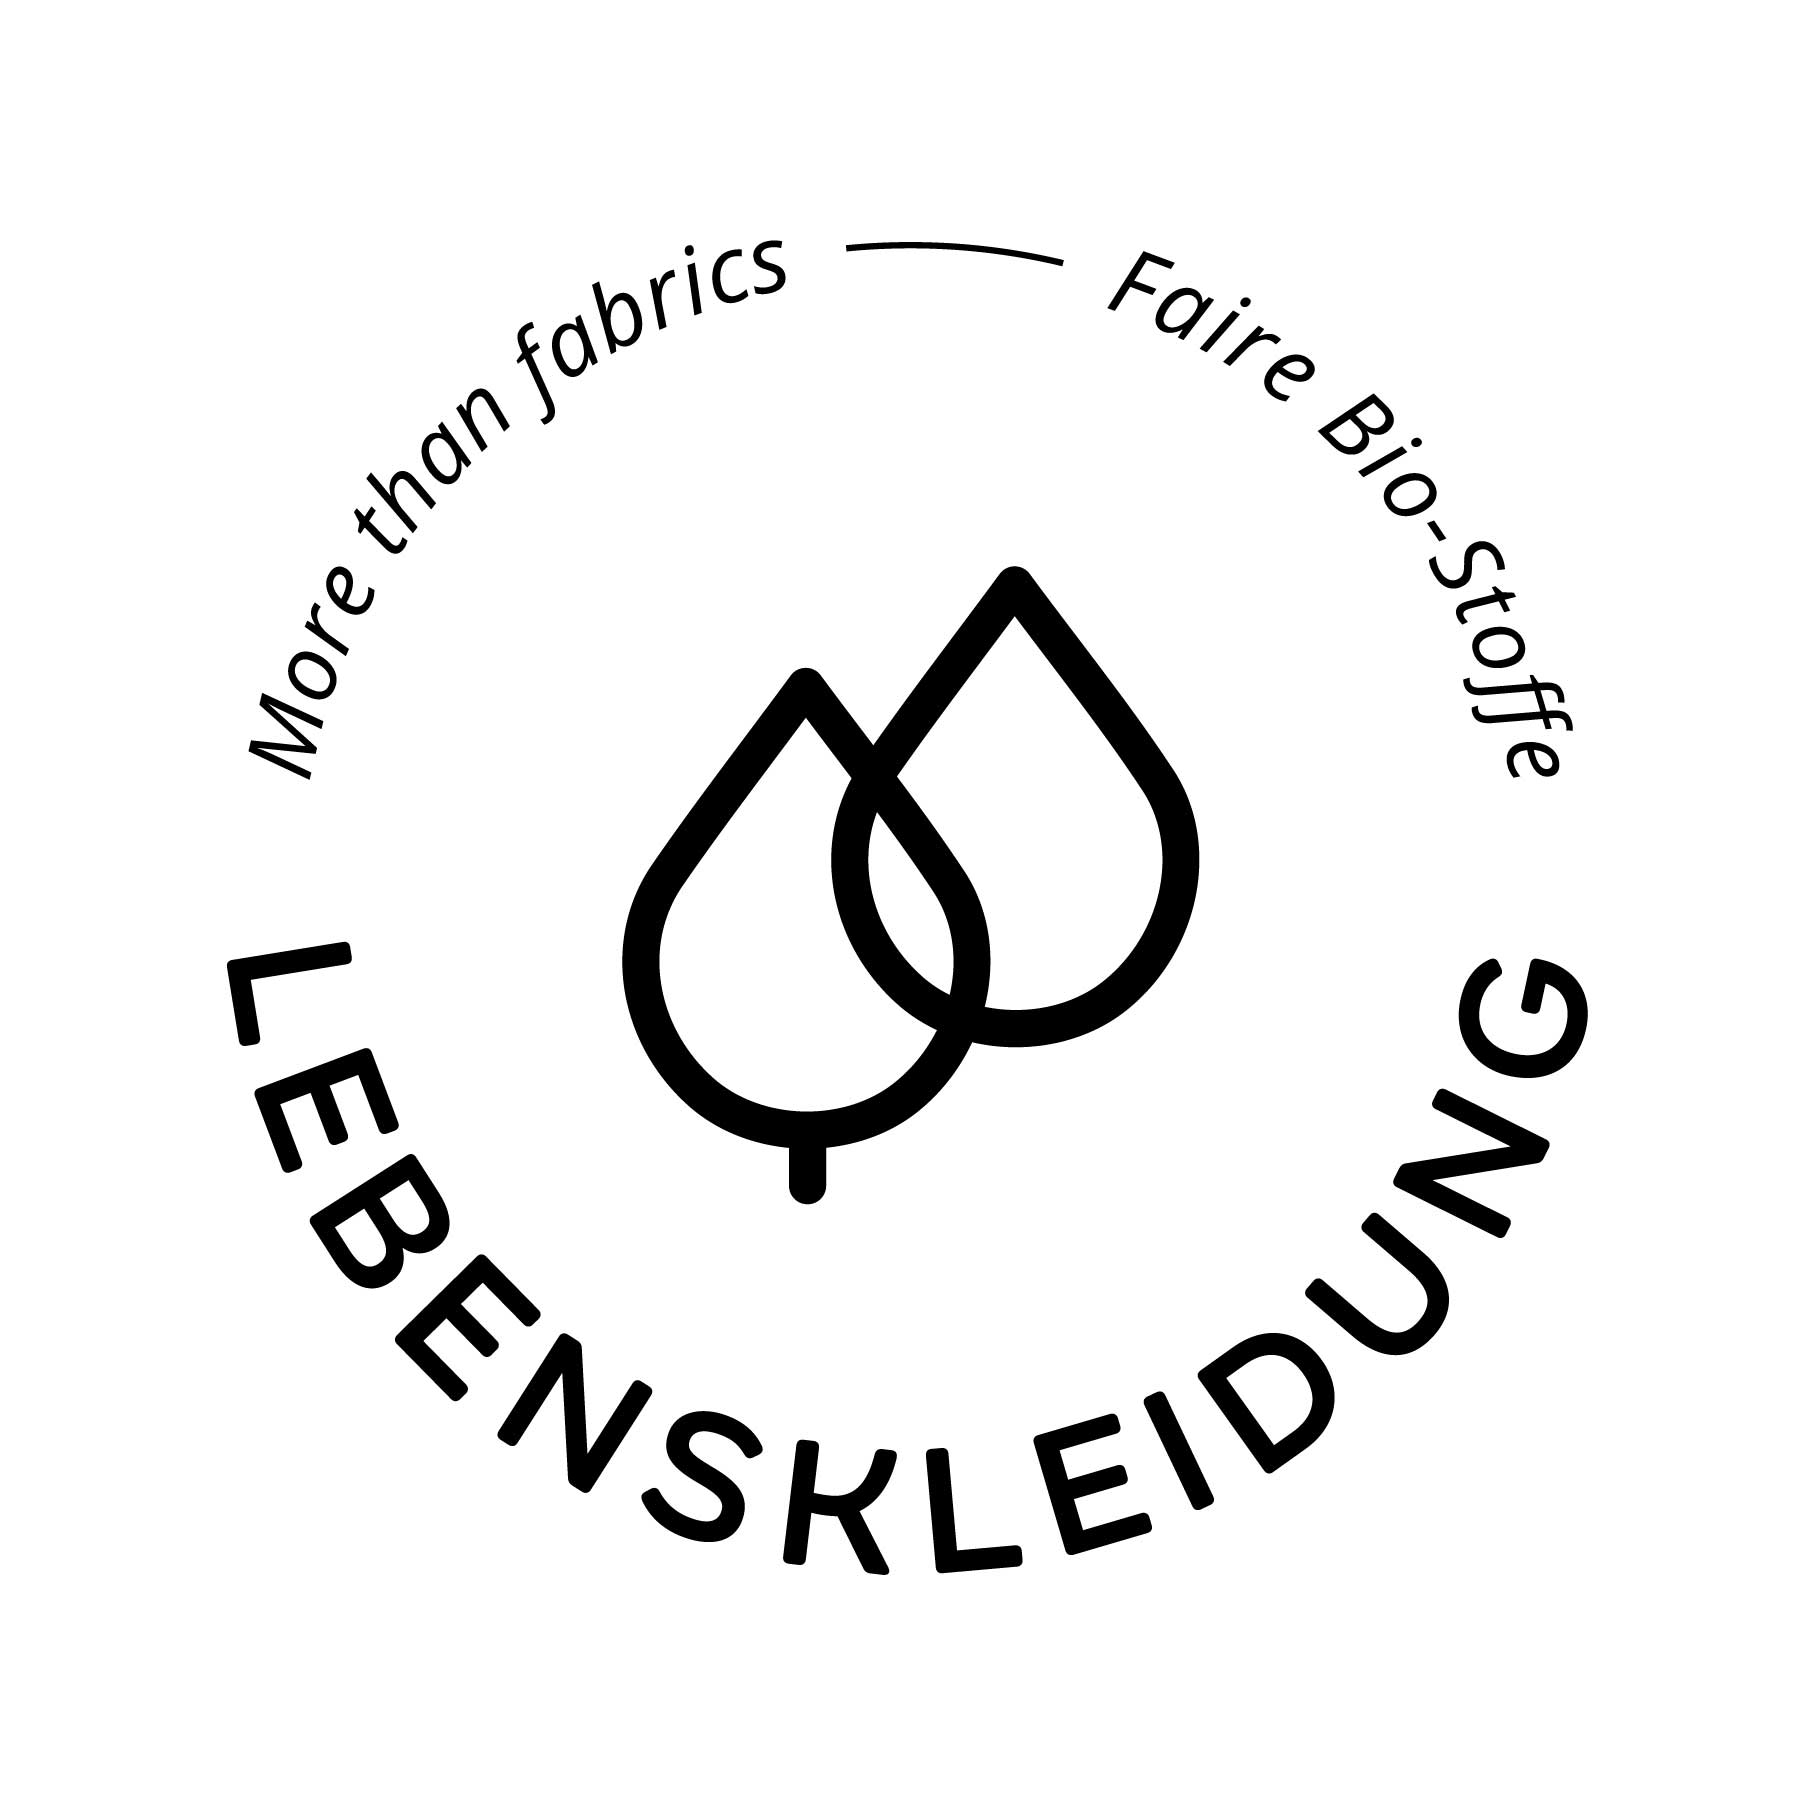 Organic RIB 2x1 (Cuff fabric) - Black-2